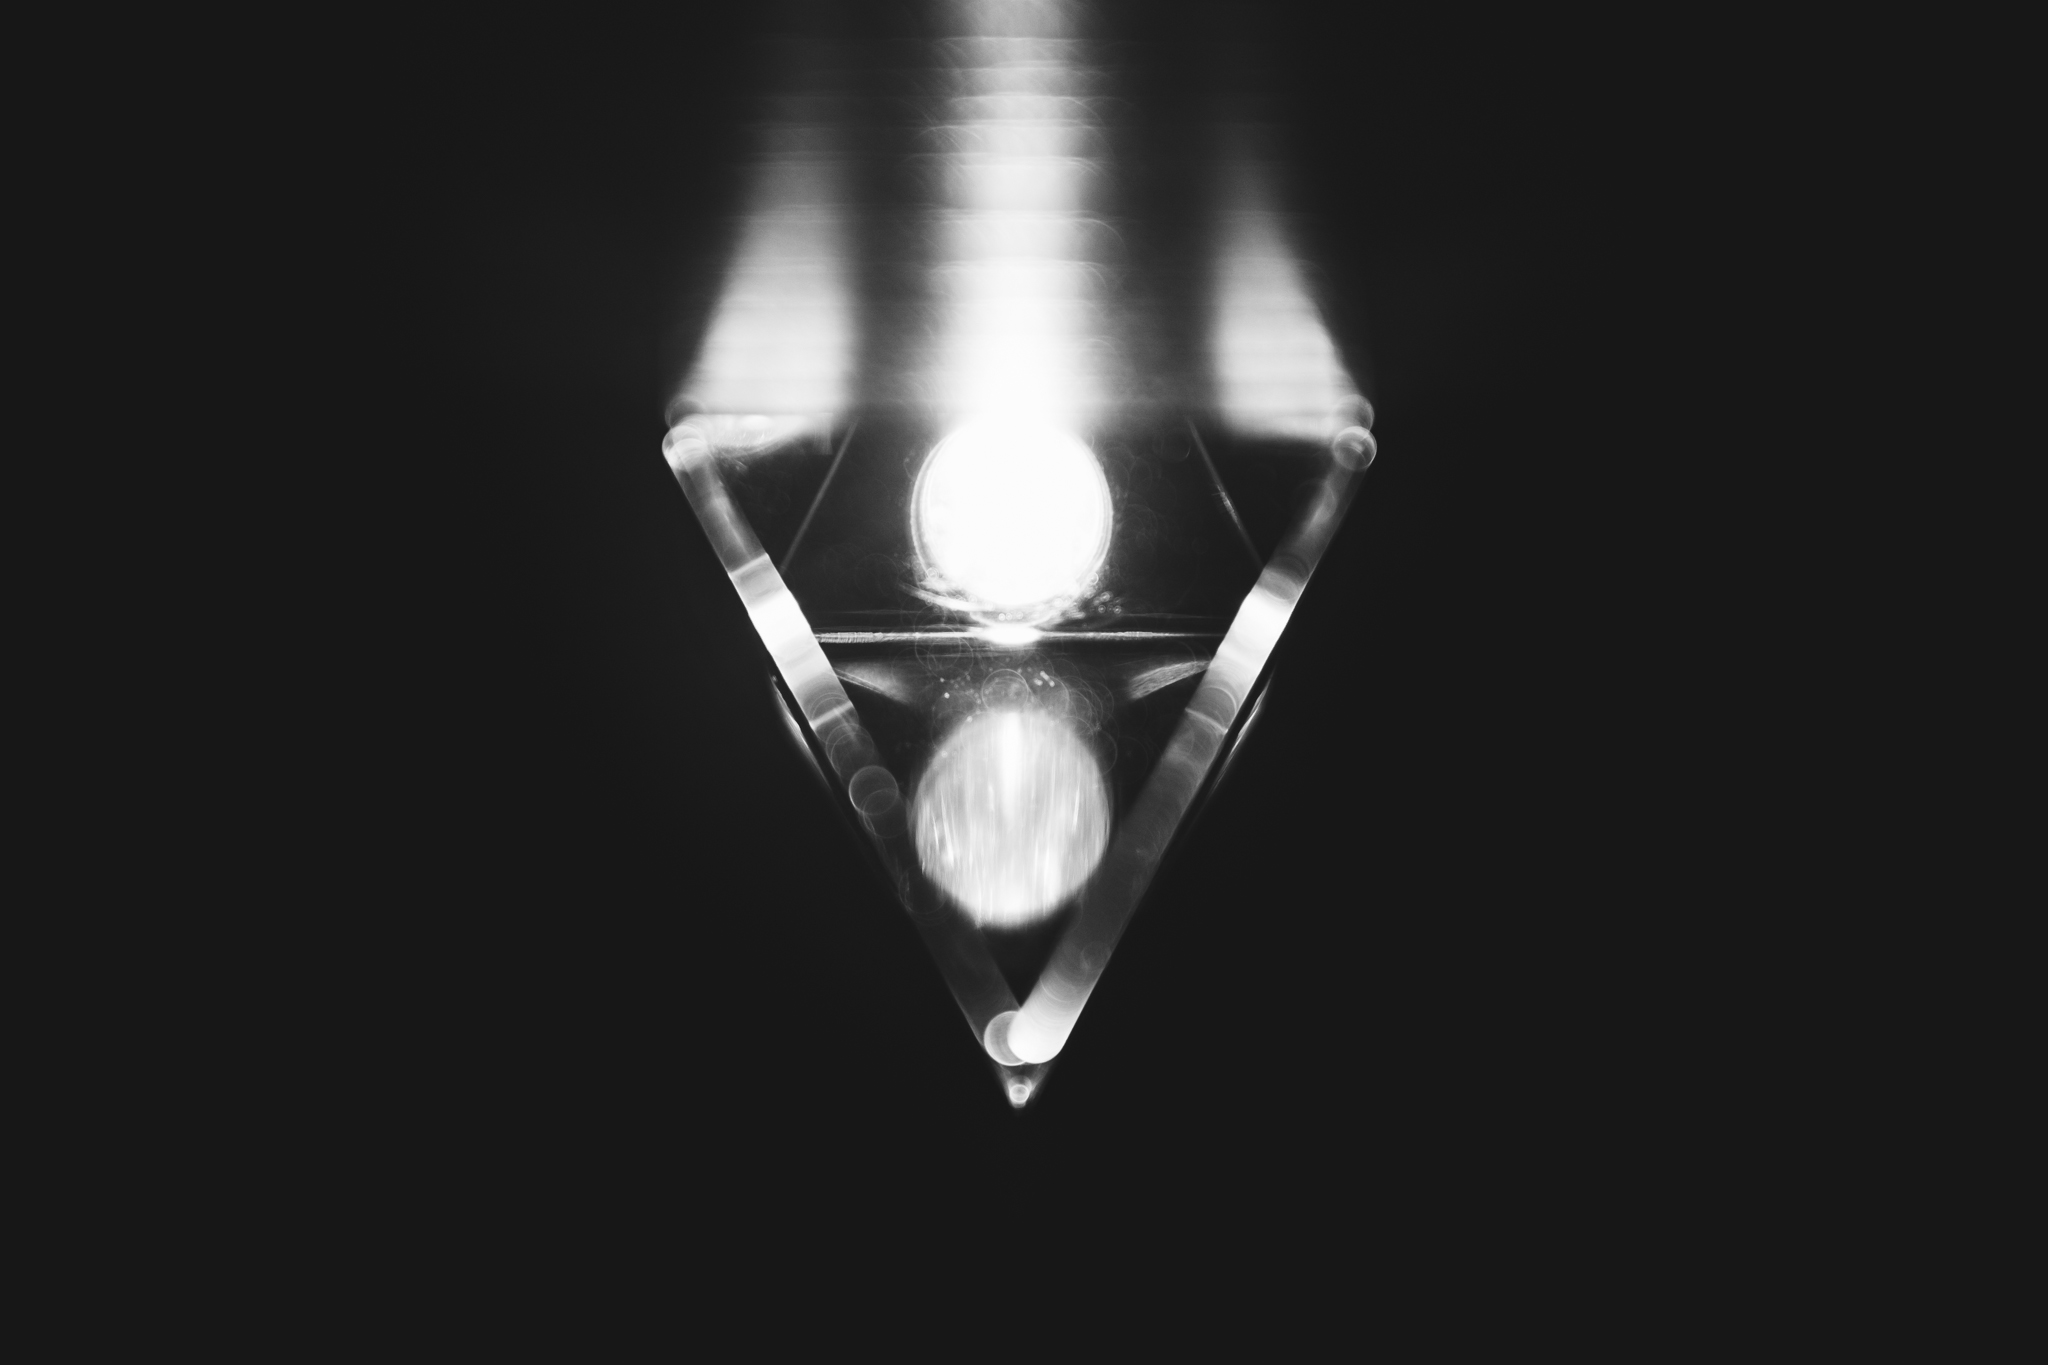 prismabstract-1.jpg